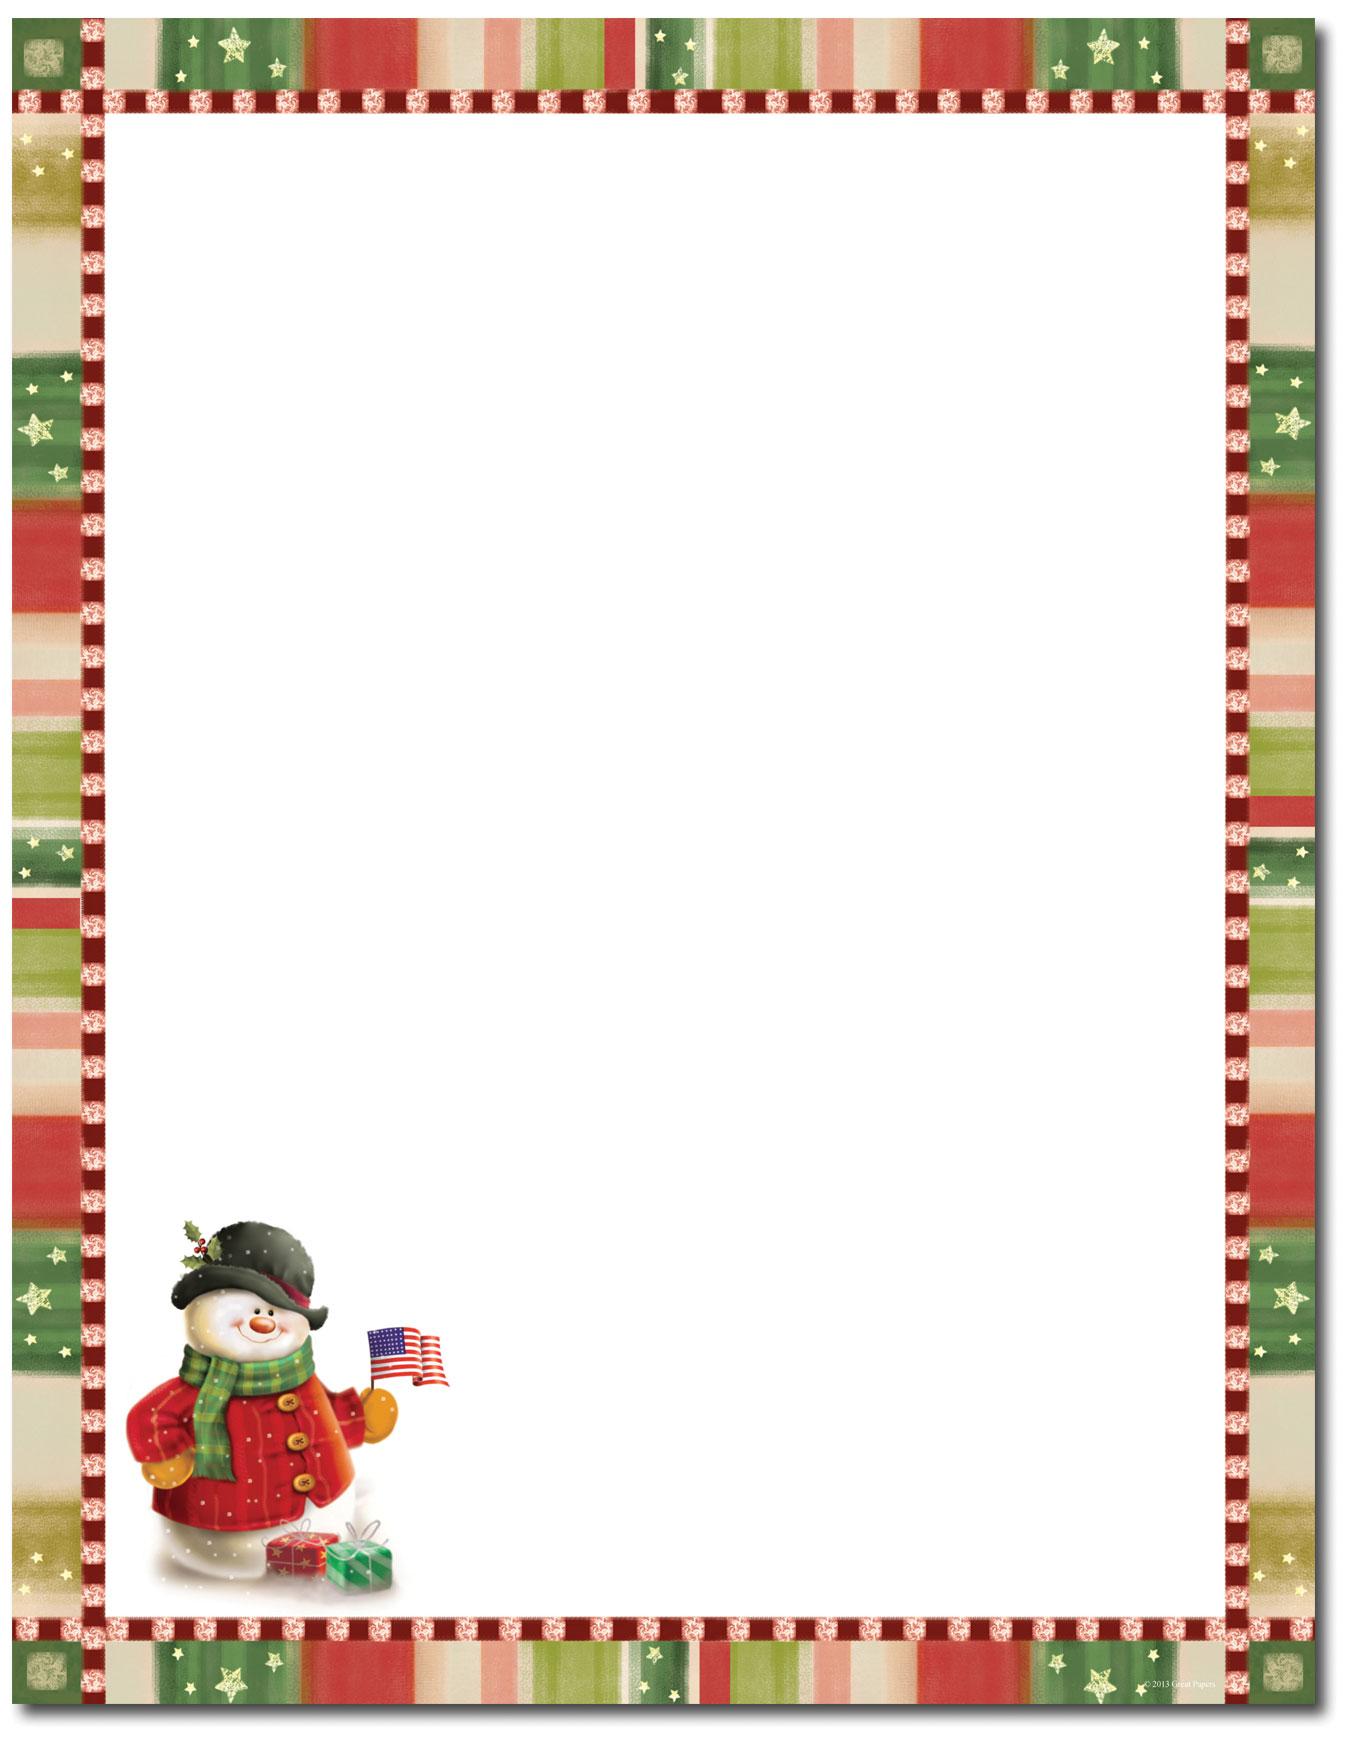 Snowflake Border Template Free | New Calendar Template Site